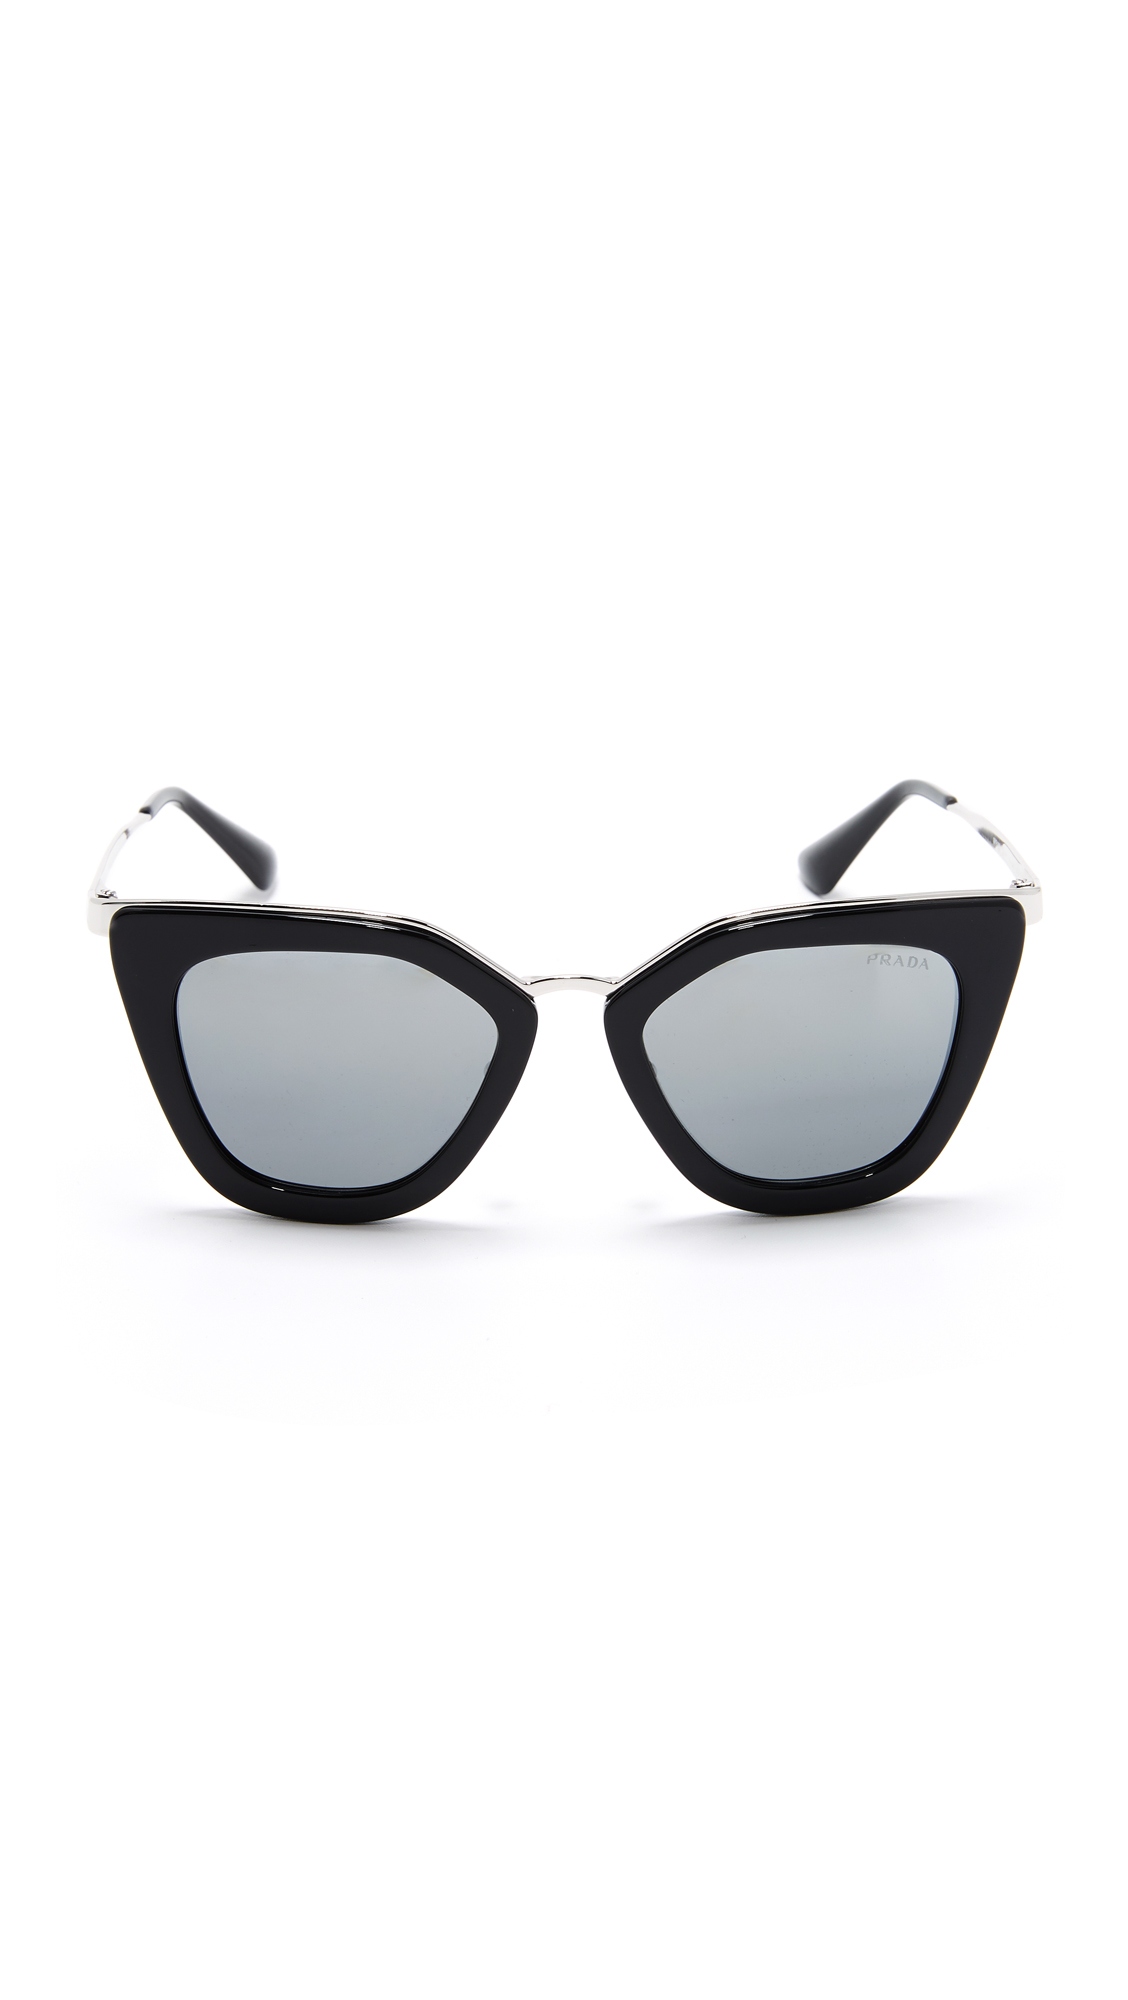 0cacac78a6 Prada Metal Bridge Mirrored Sunglasses